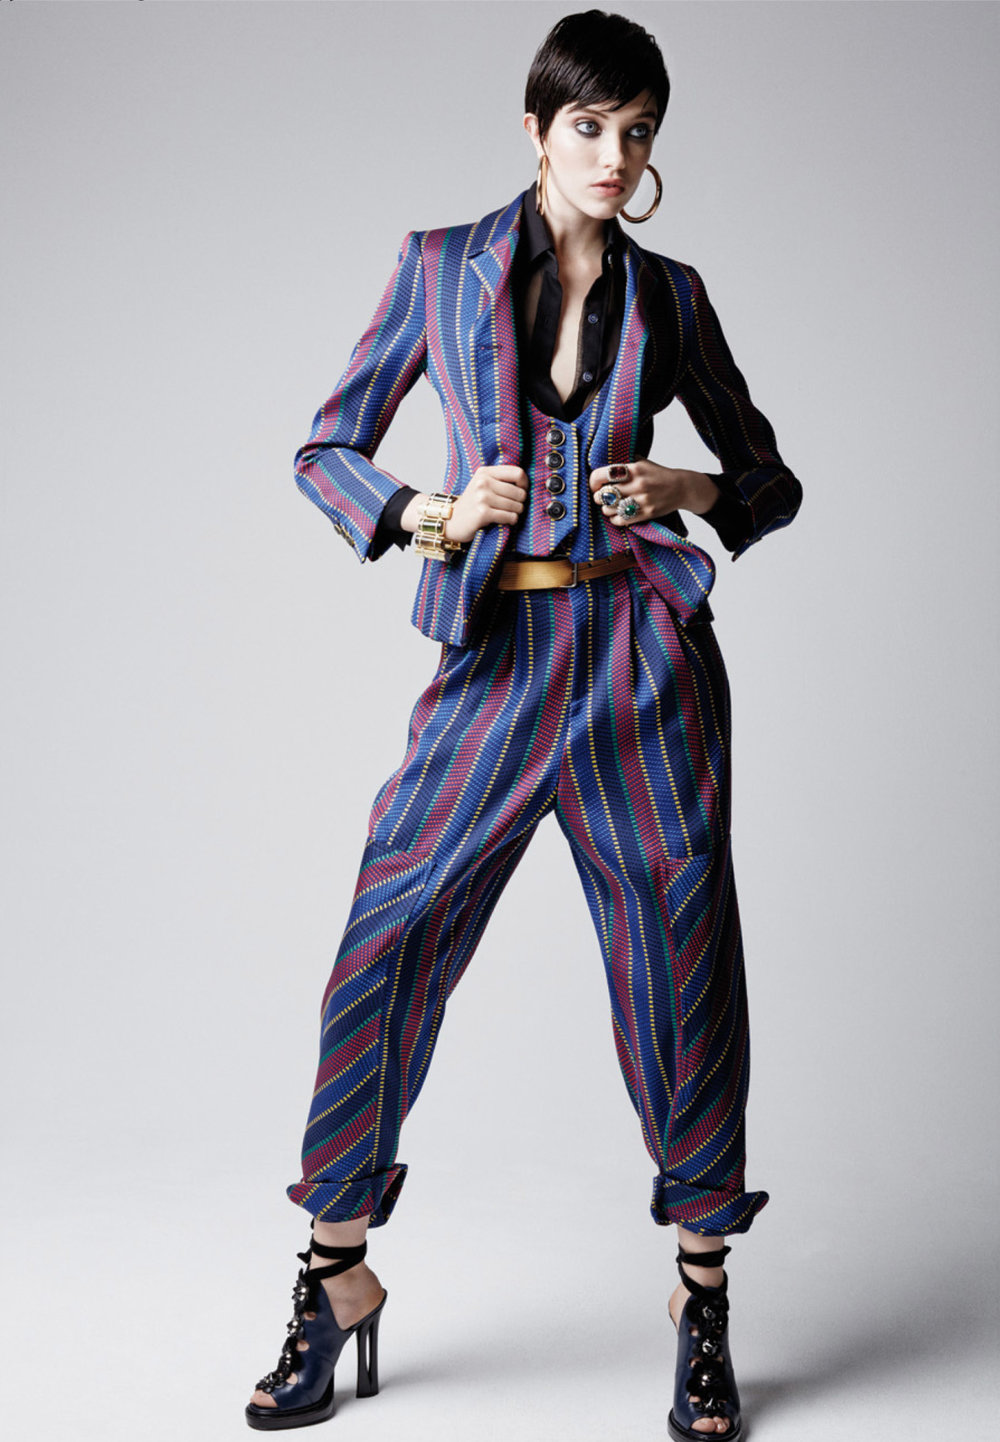 Giovanna-Battaglia-W-Magazine-Funny-Business-Patrick-Demarchelier-1.jpg